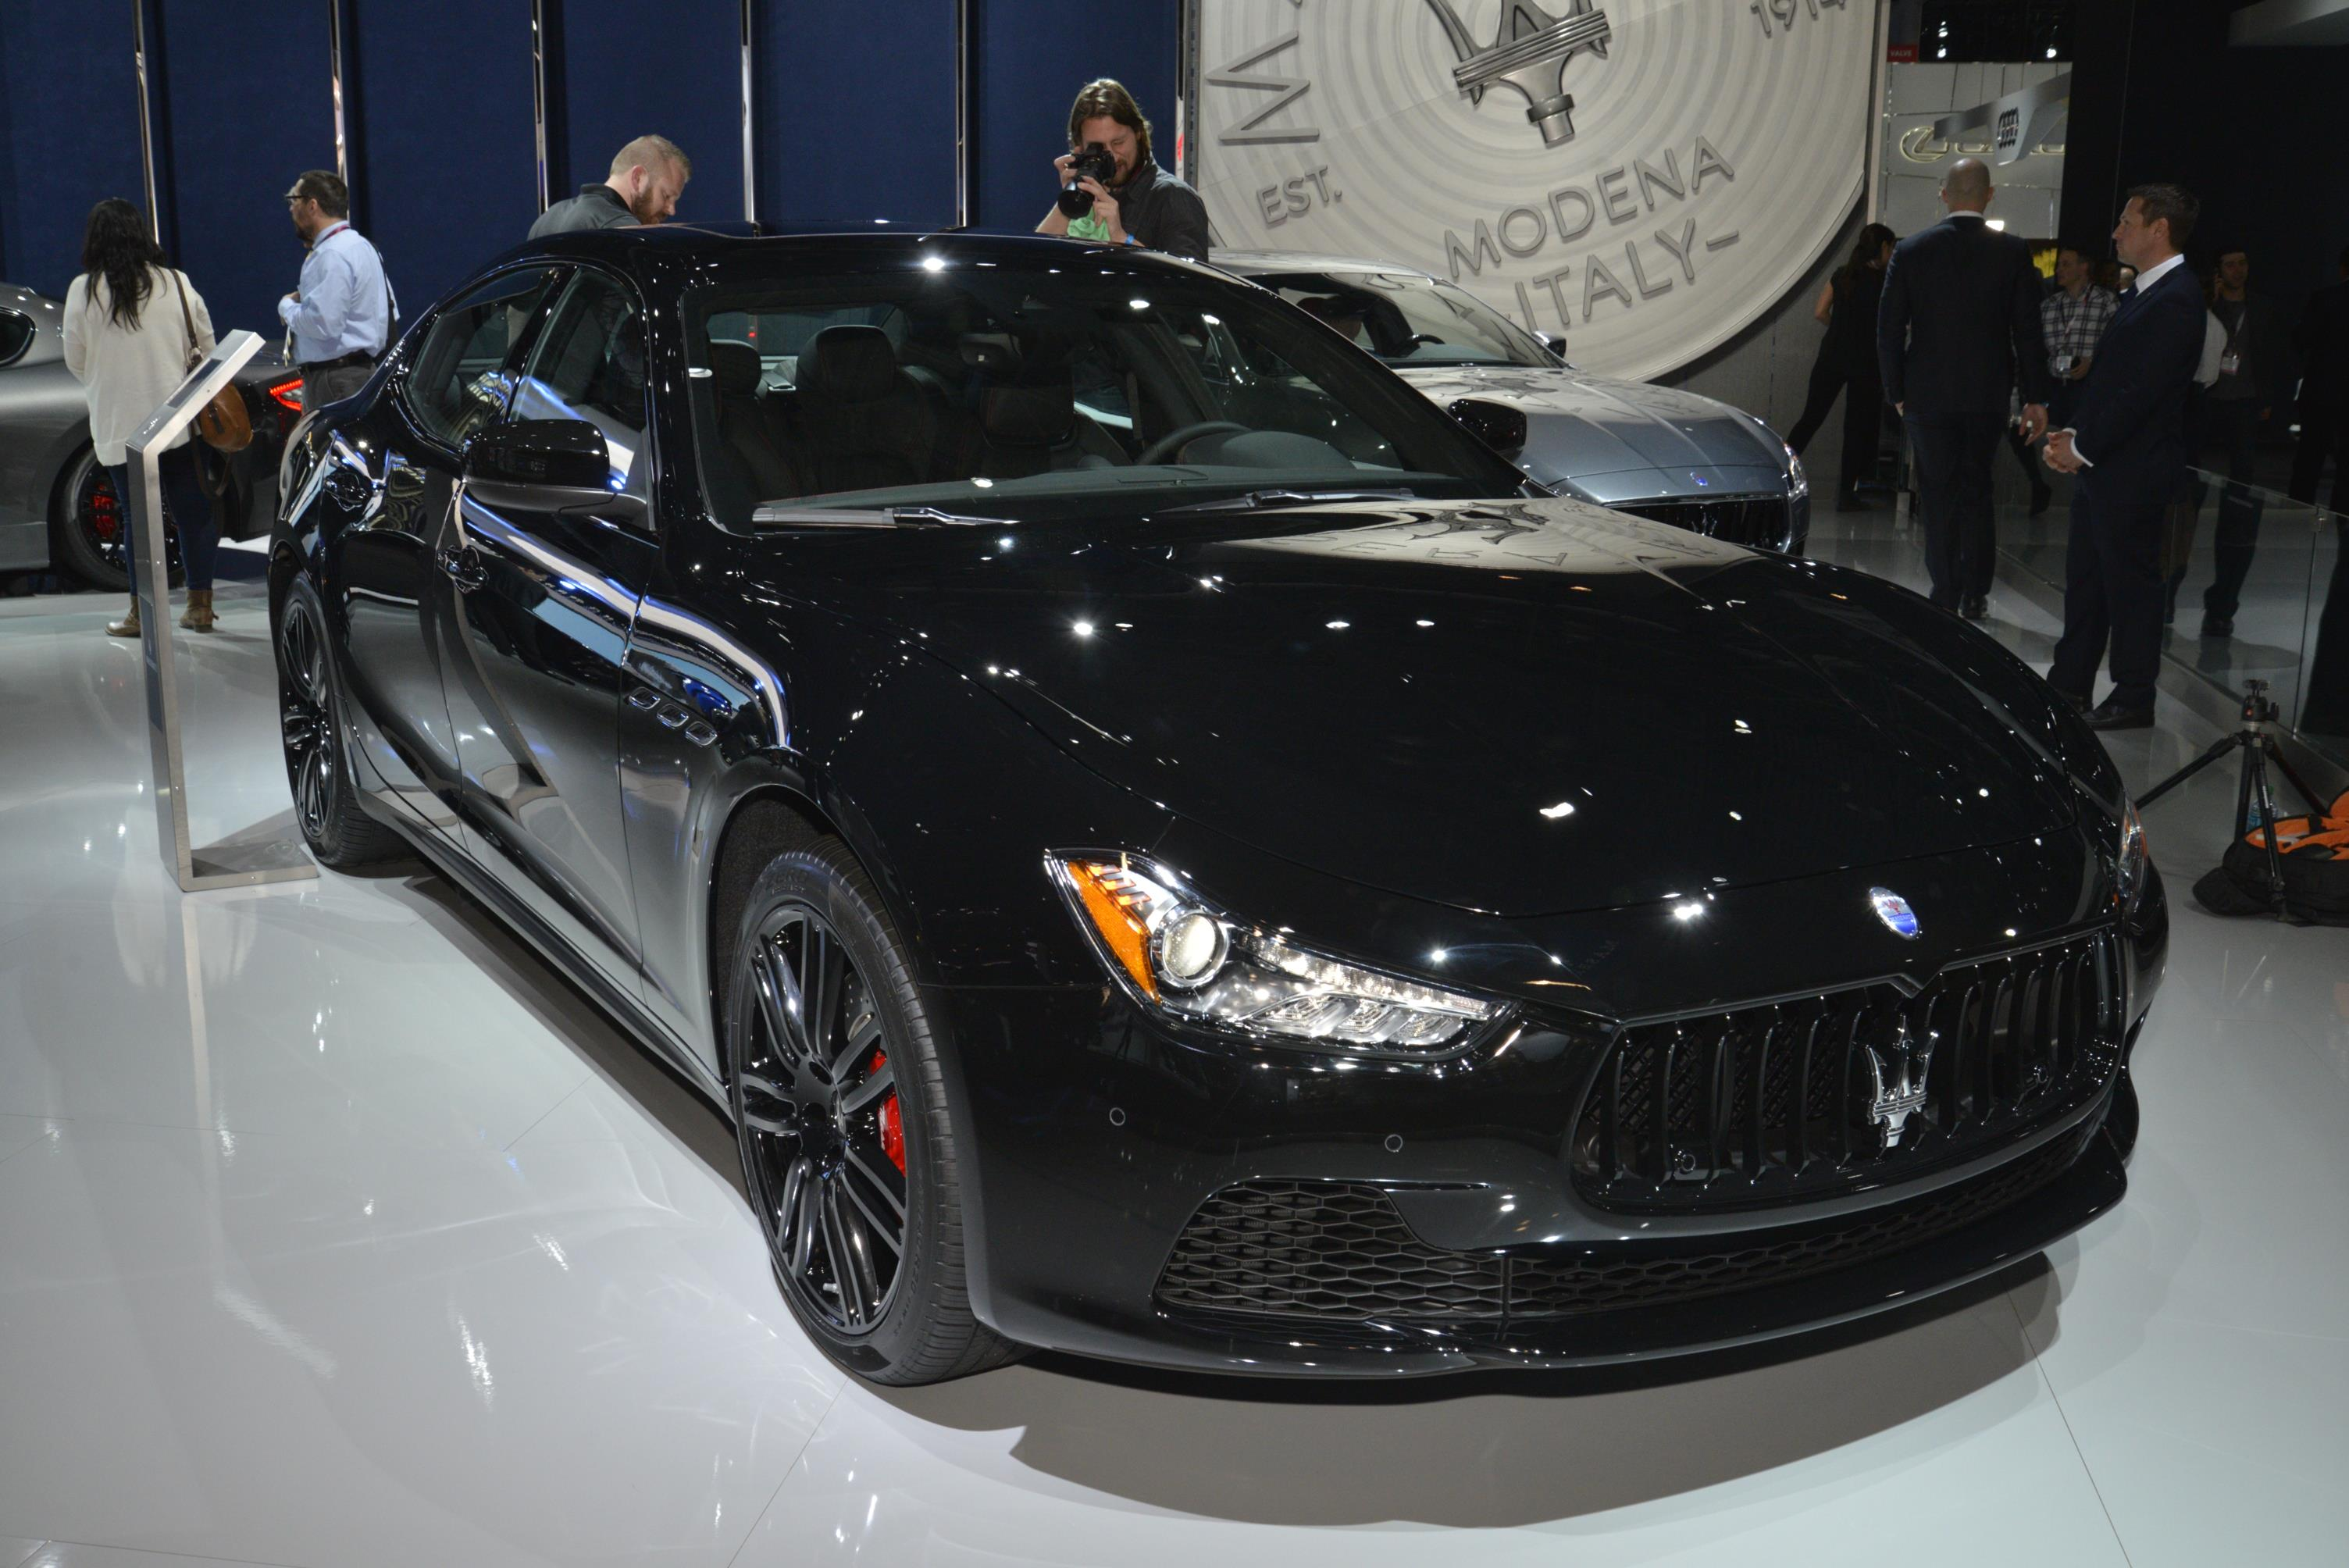 New York Auto Show 2017 (108)